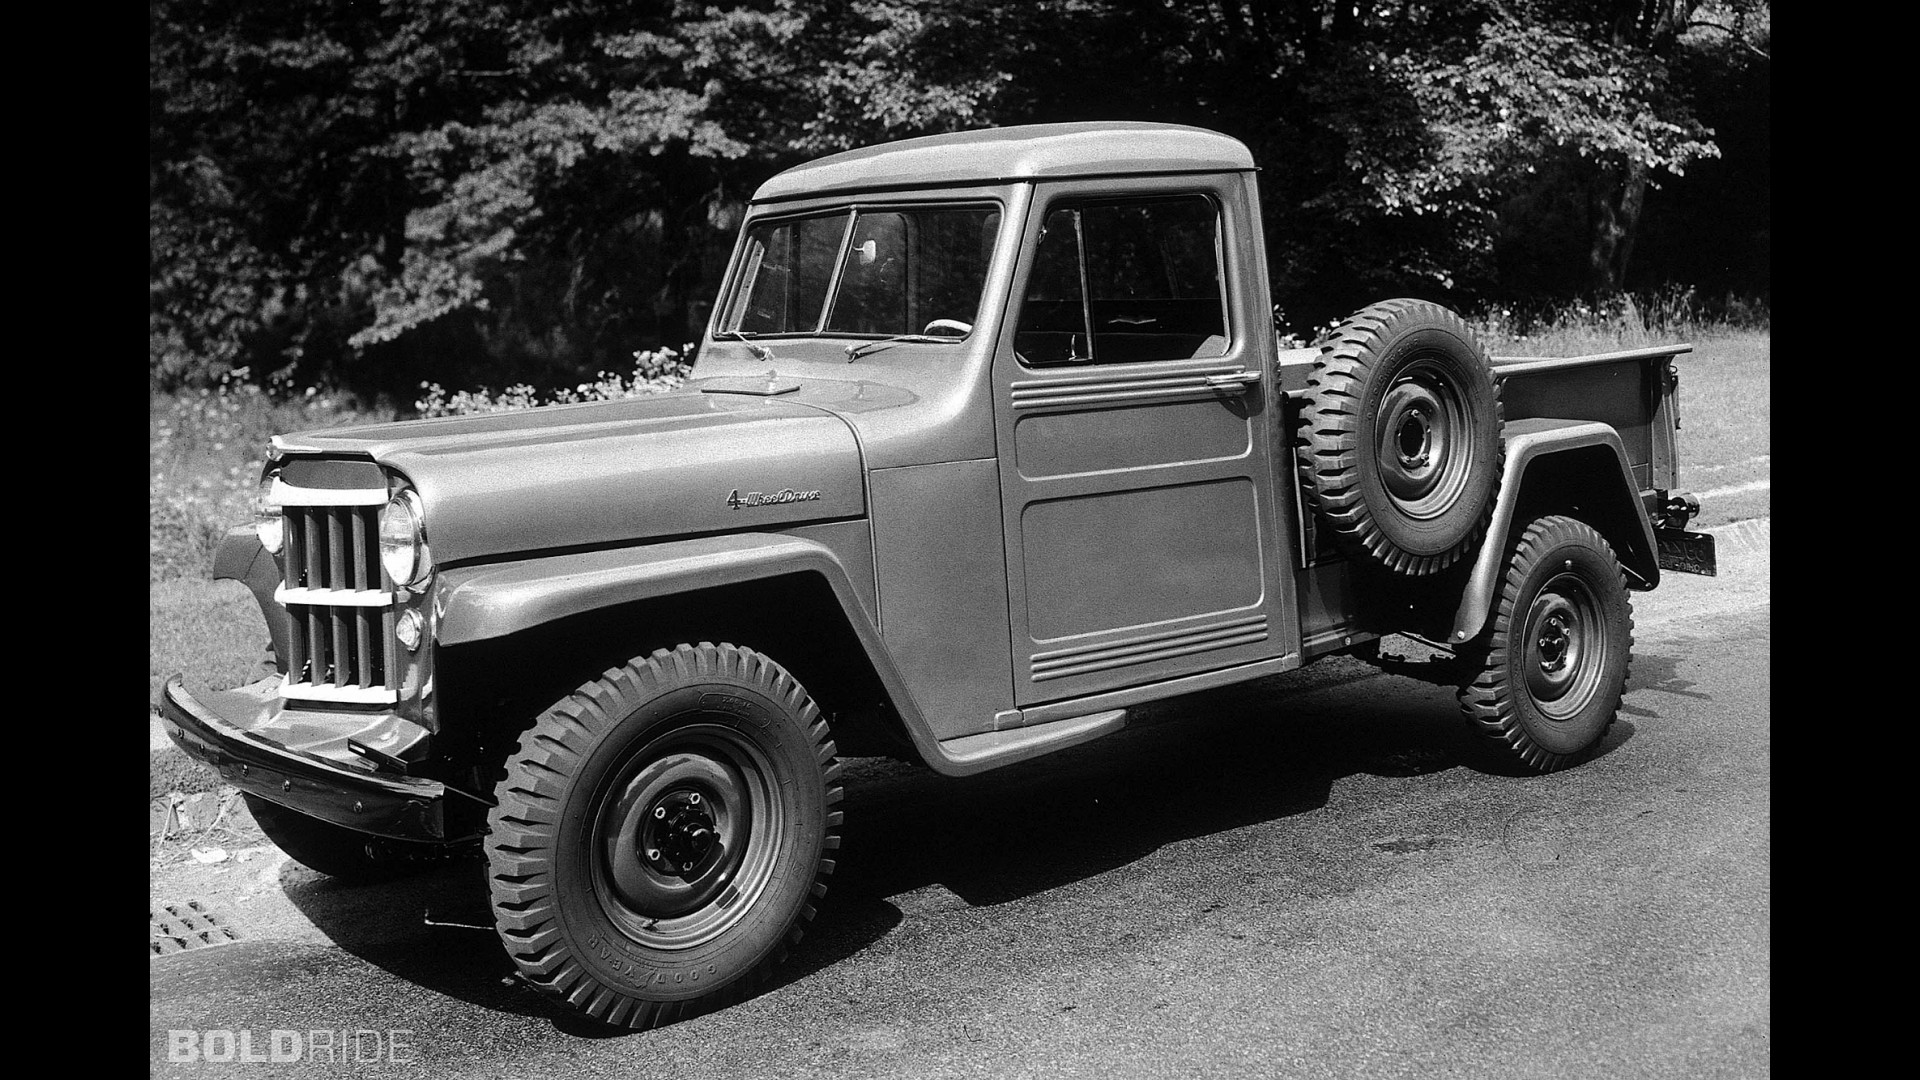 jeep 4wd one ton pickup truck. Black Bedroom Furniture Sets. Home Design Ideas